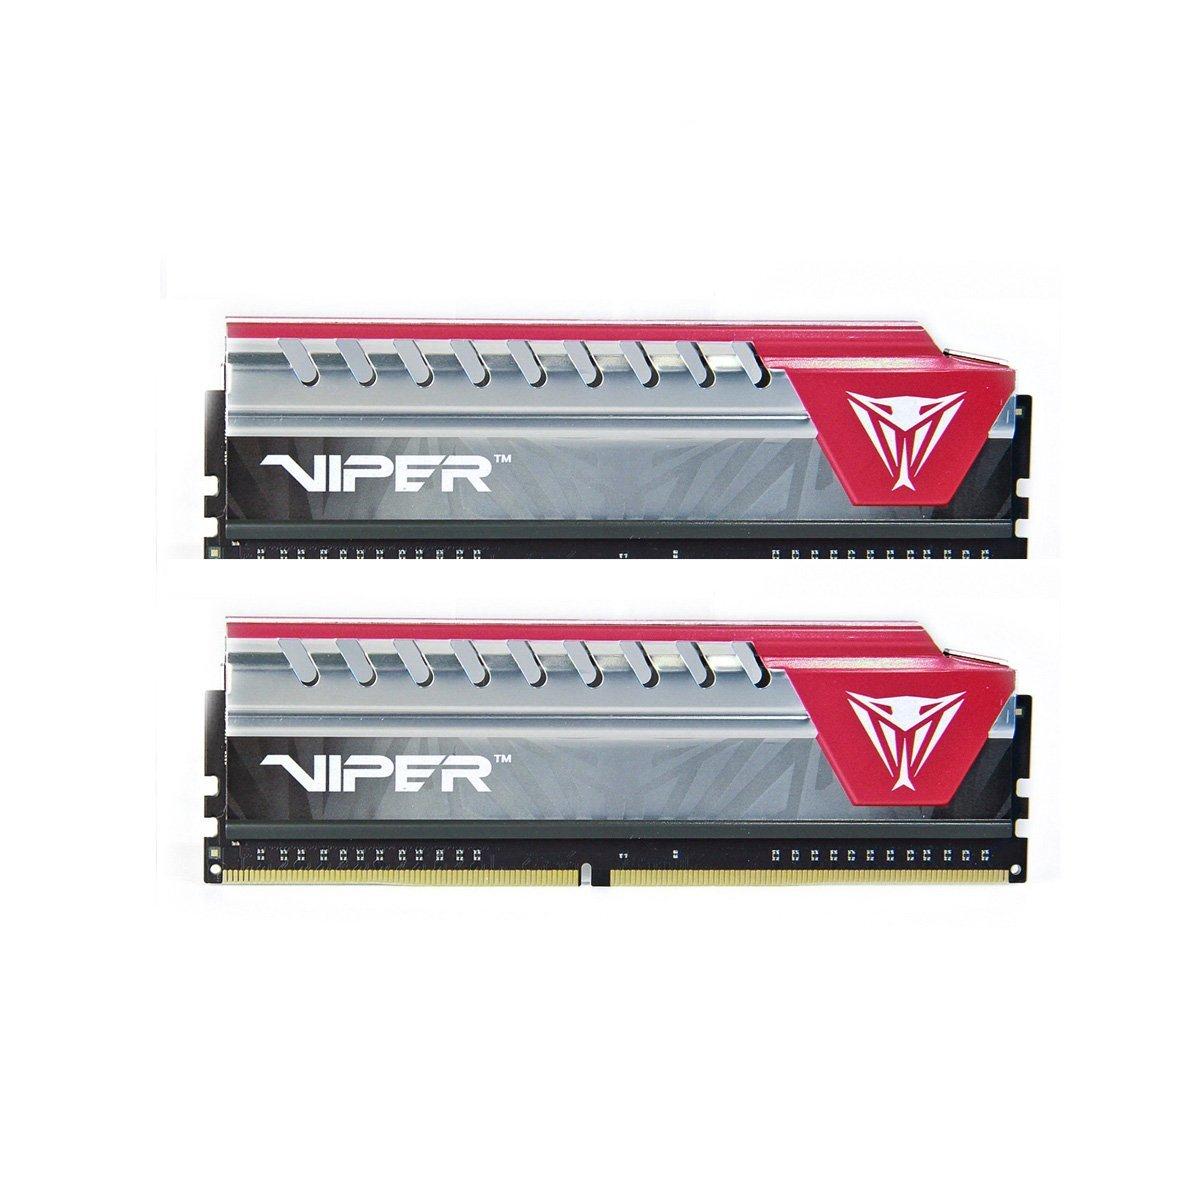 Patriot Memory Viper Elite Series DDR4 16GB 2400 MHZ Arbeitsspeicher RAM [Amazon]